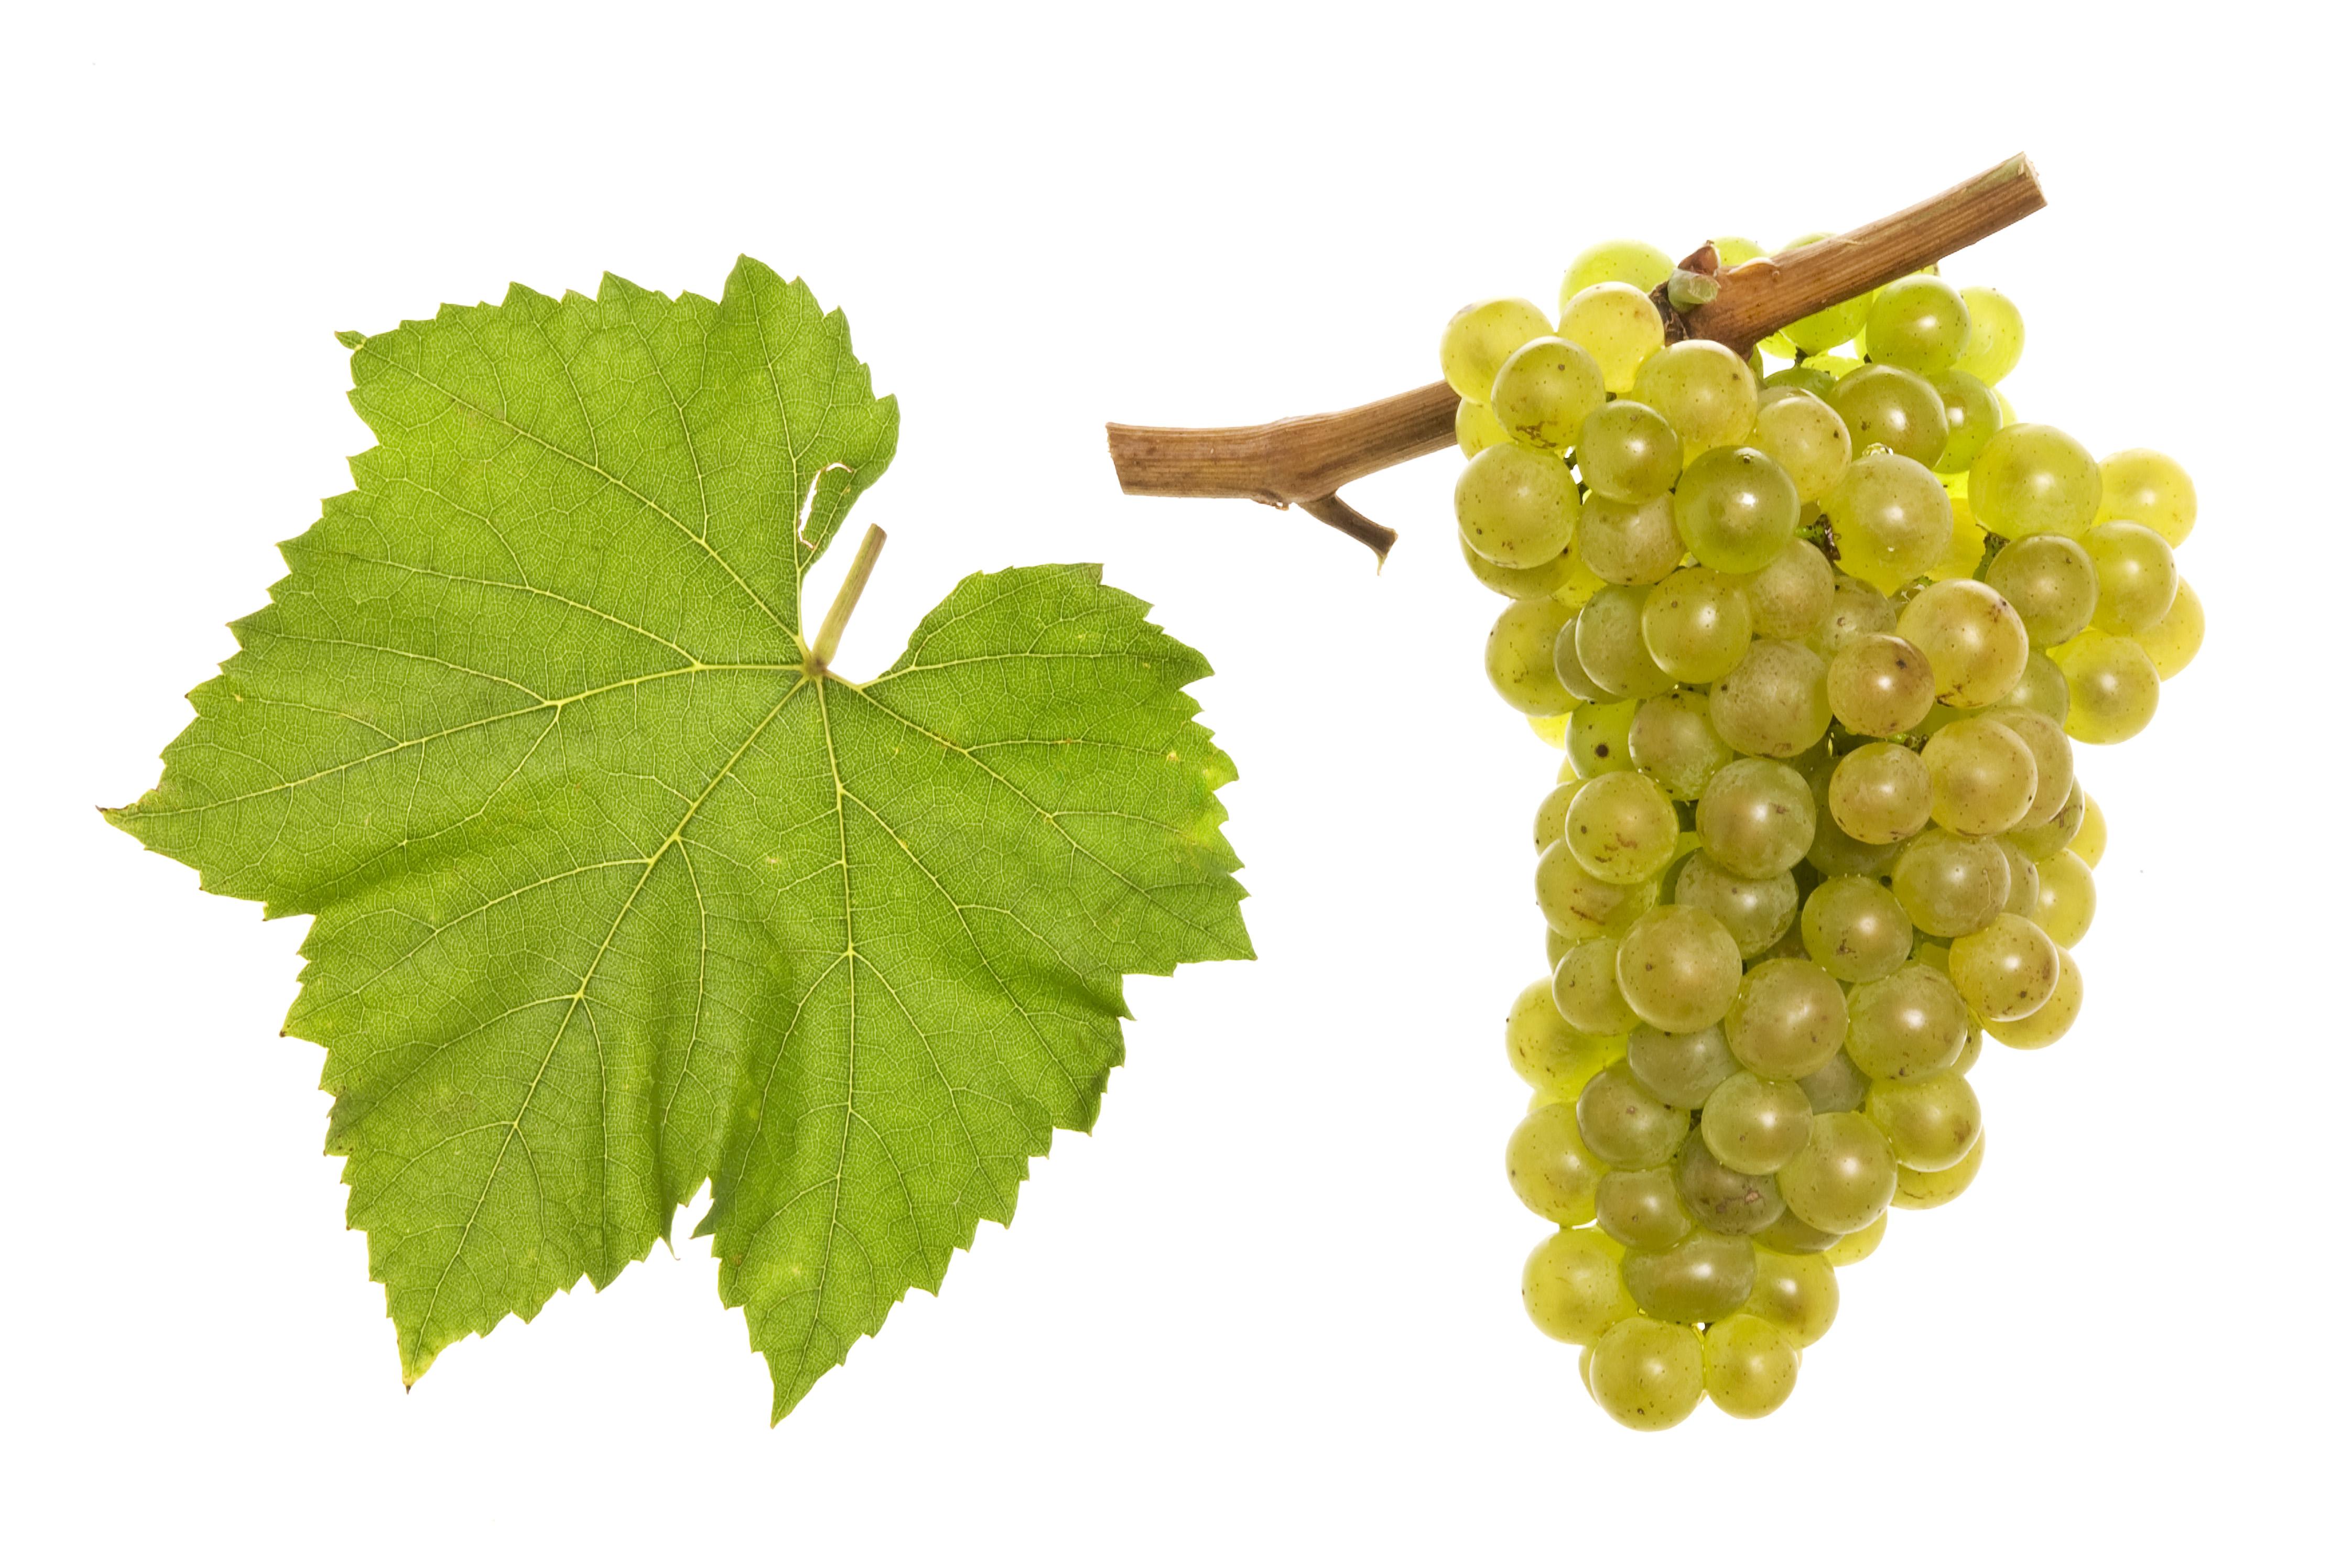 rebsorte weißwein kreuzworträtsel